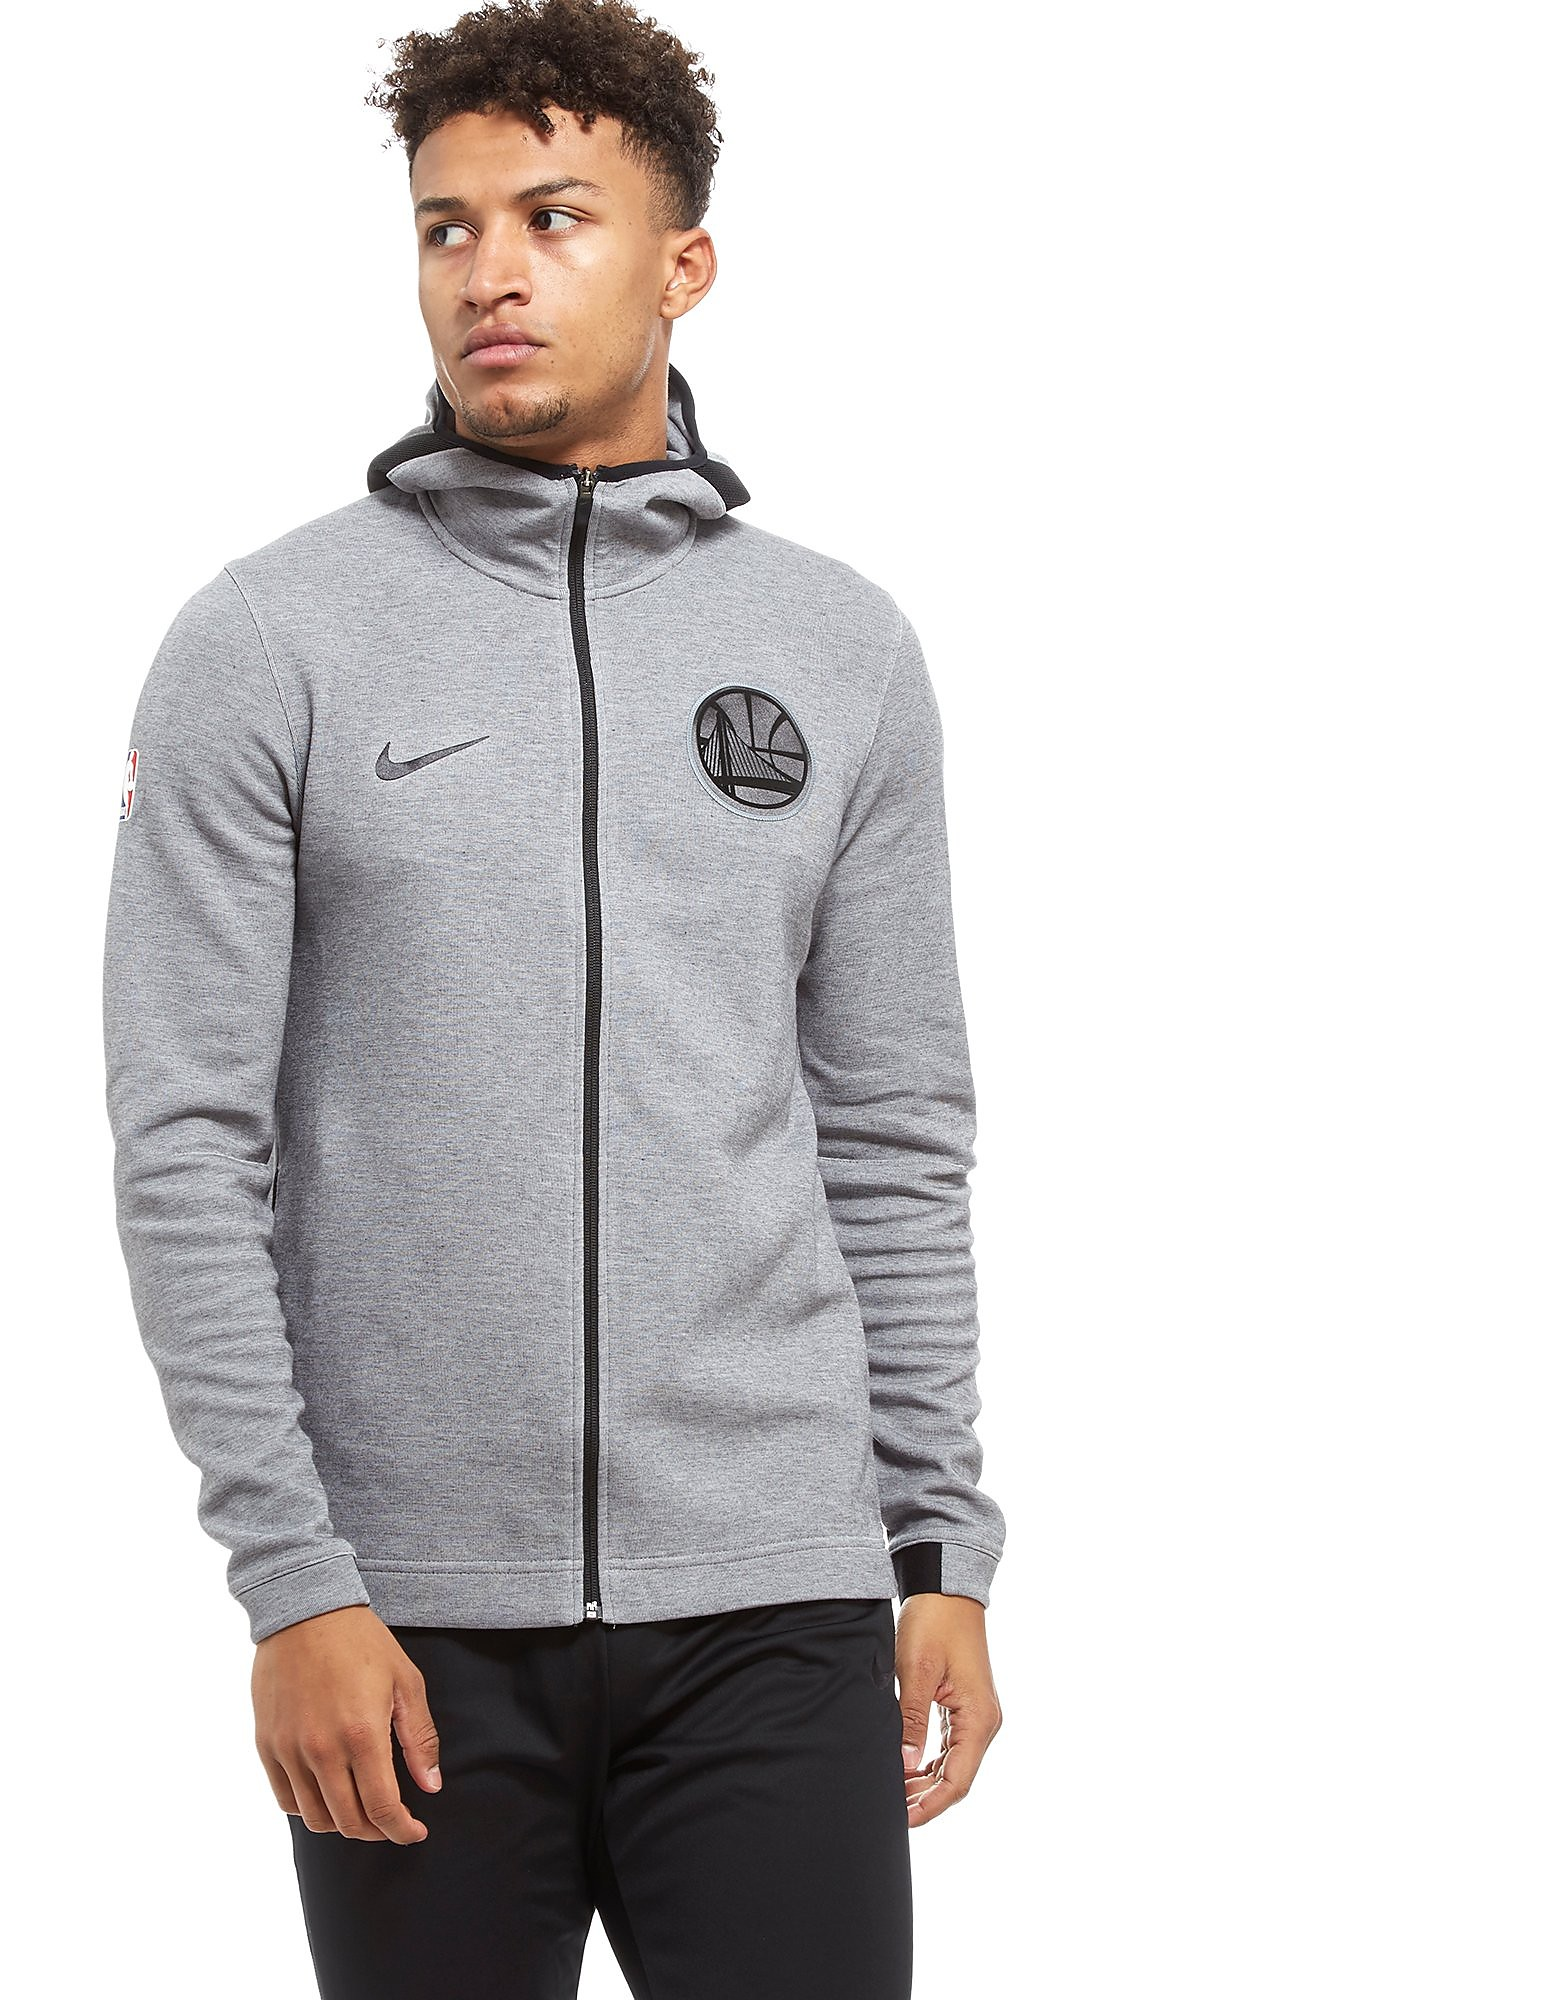 Nike NBA Golden State Warriors Therma Flex Hoodie